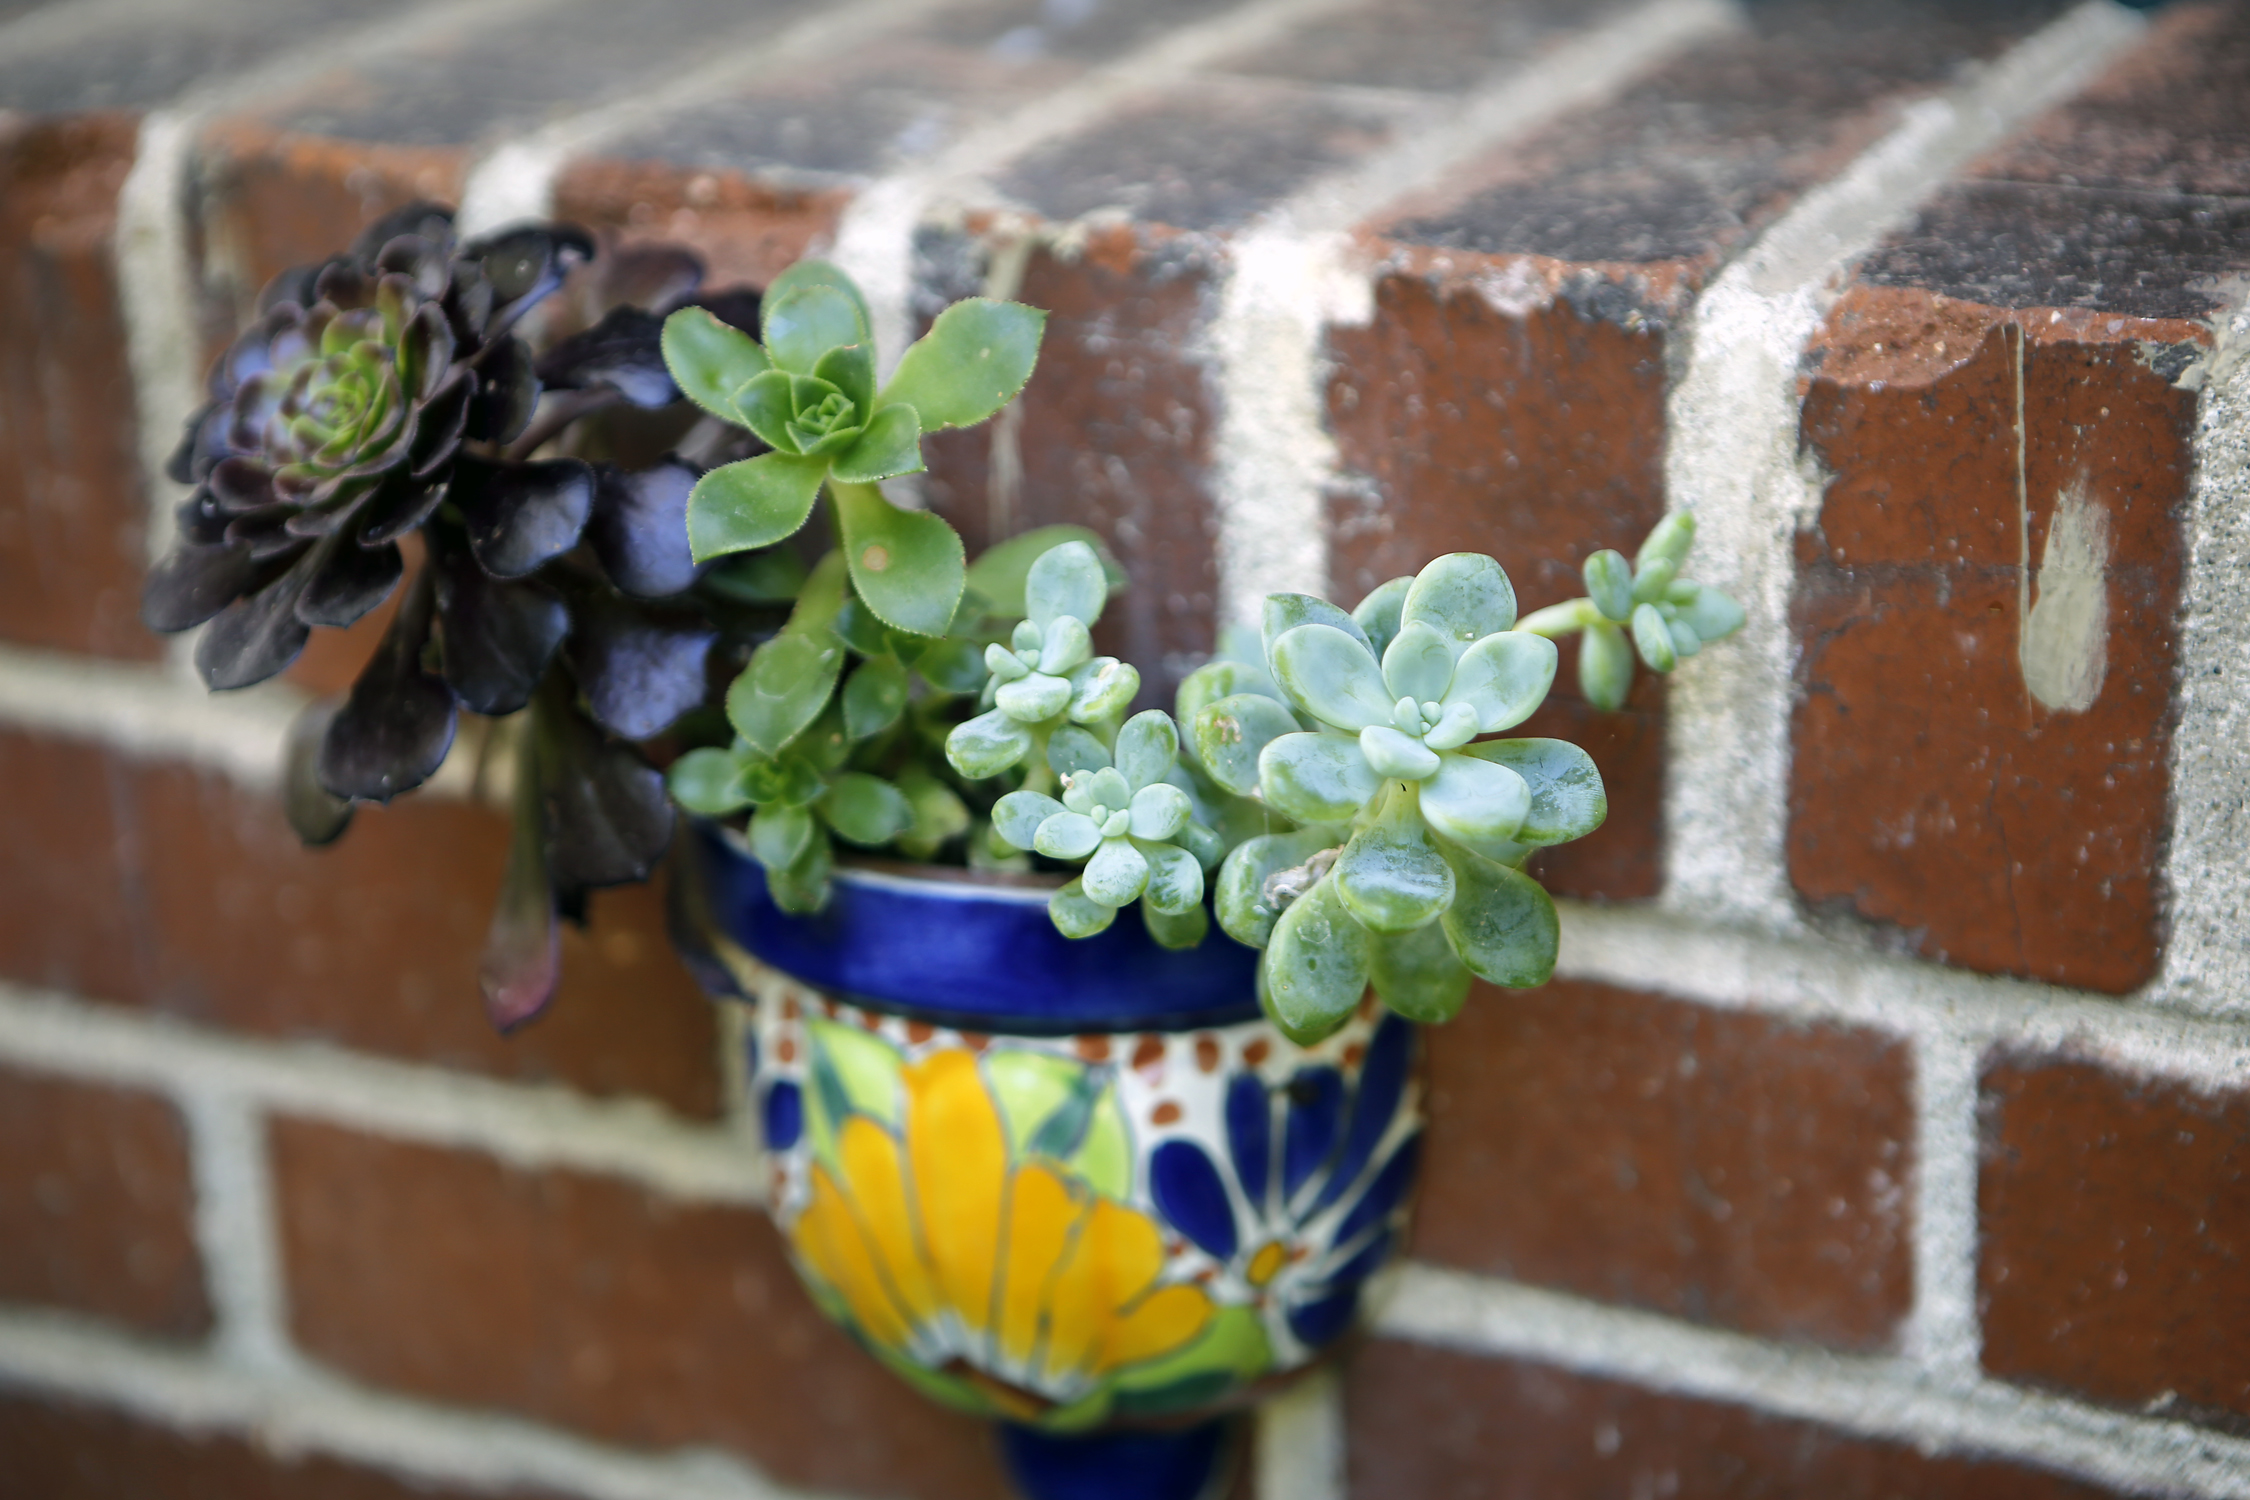 Get ideas for your own home garden at Master Gardener tour